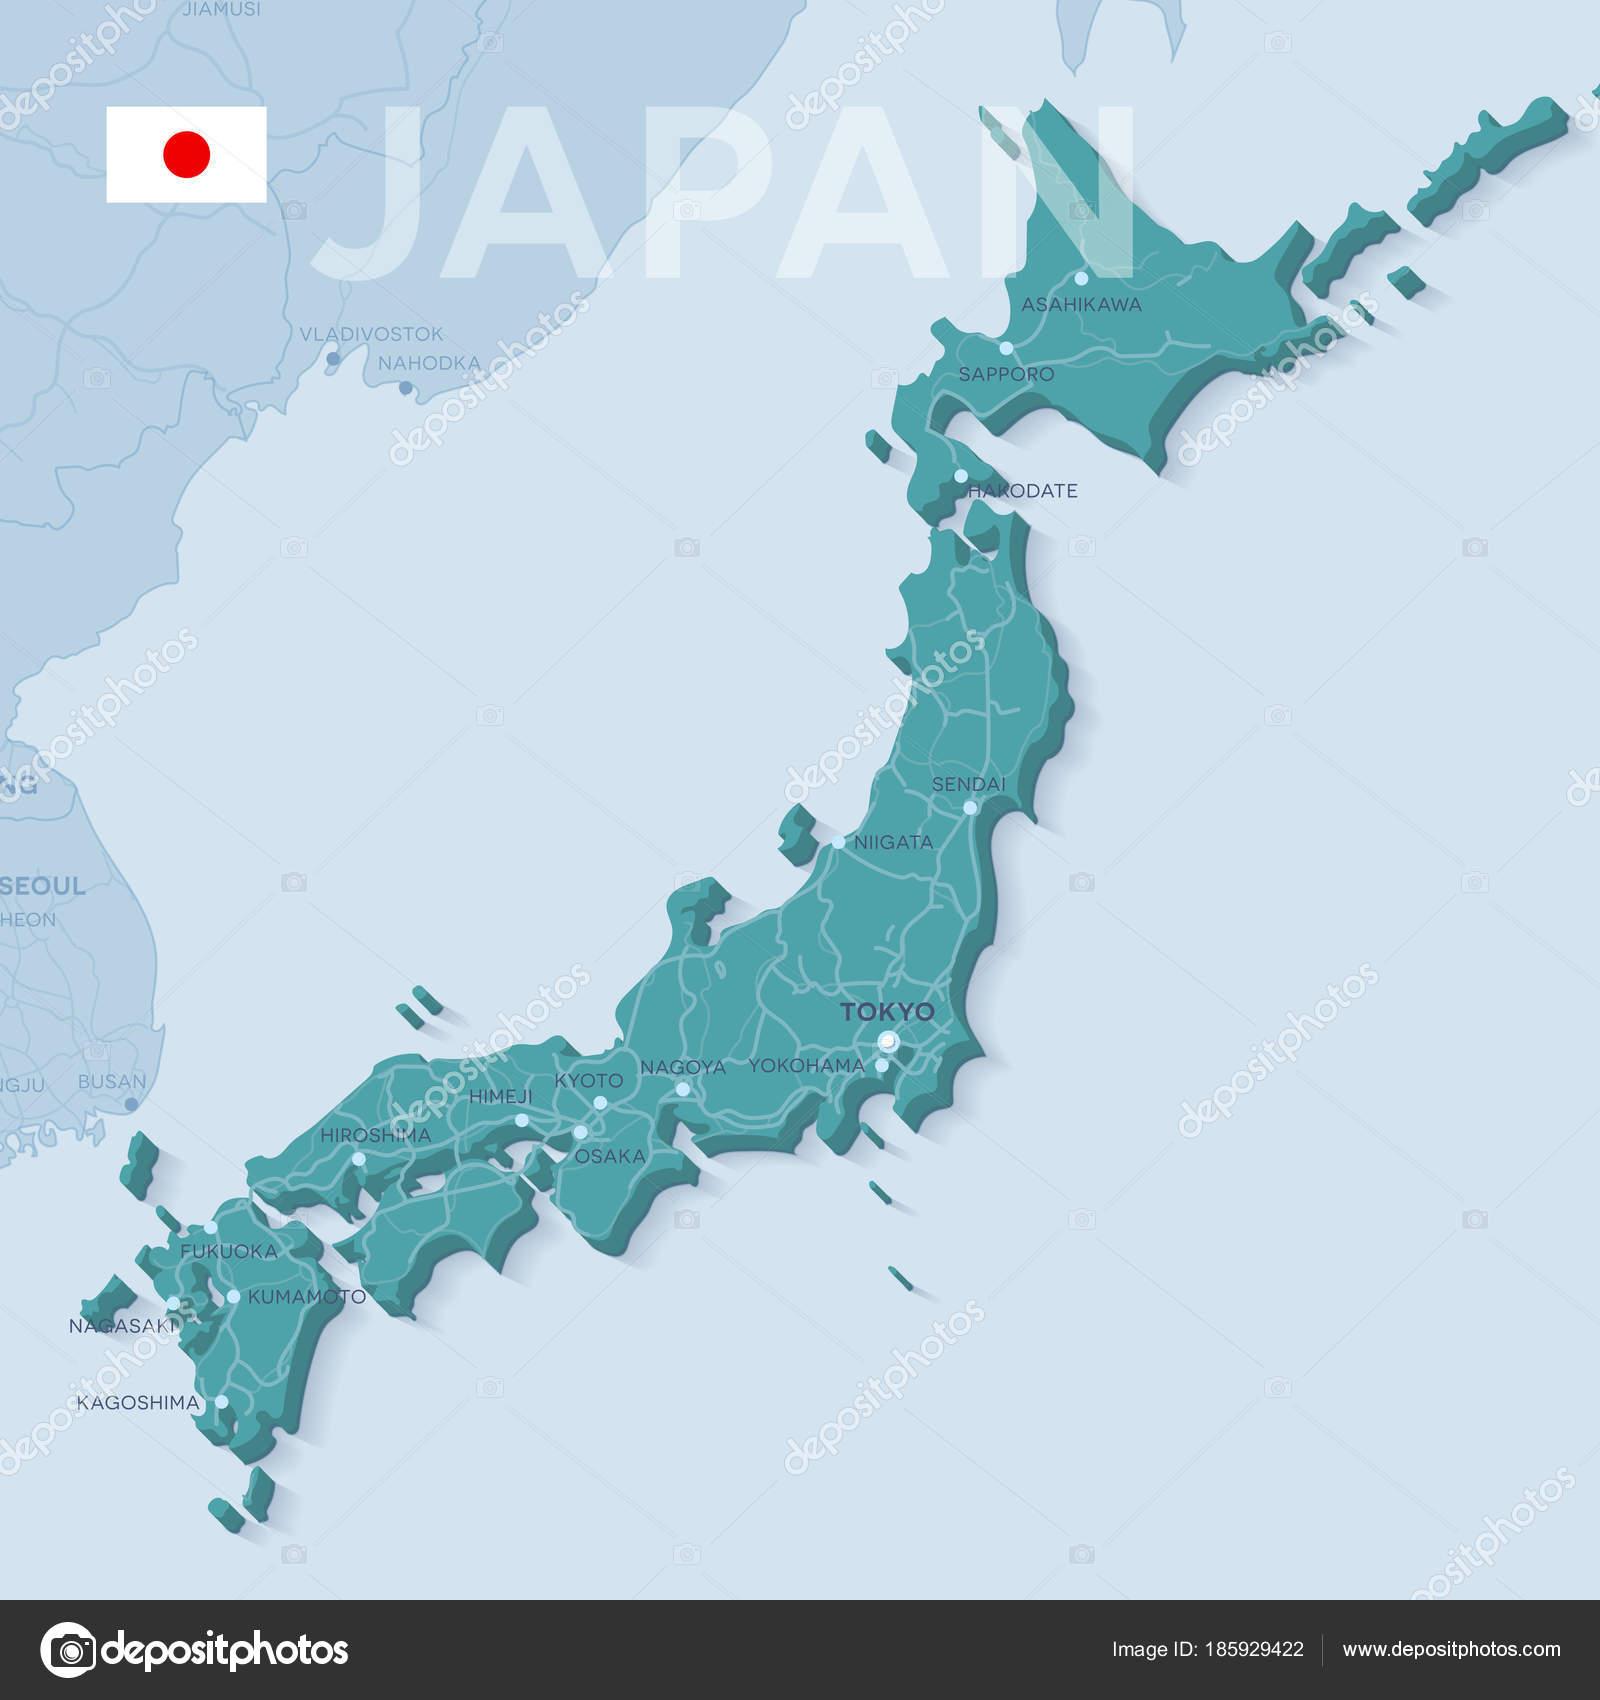 Verctor Map Of Cities And Roads In Japan Stock Vector C Snyde